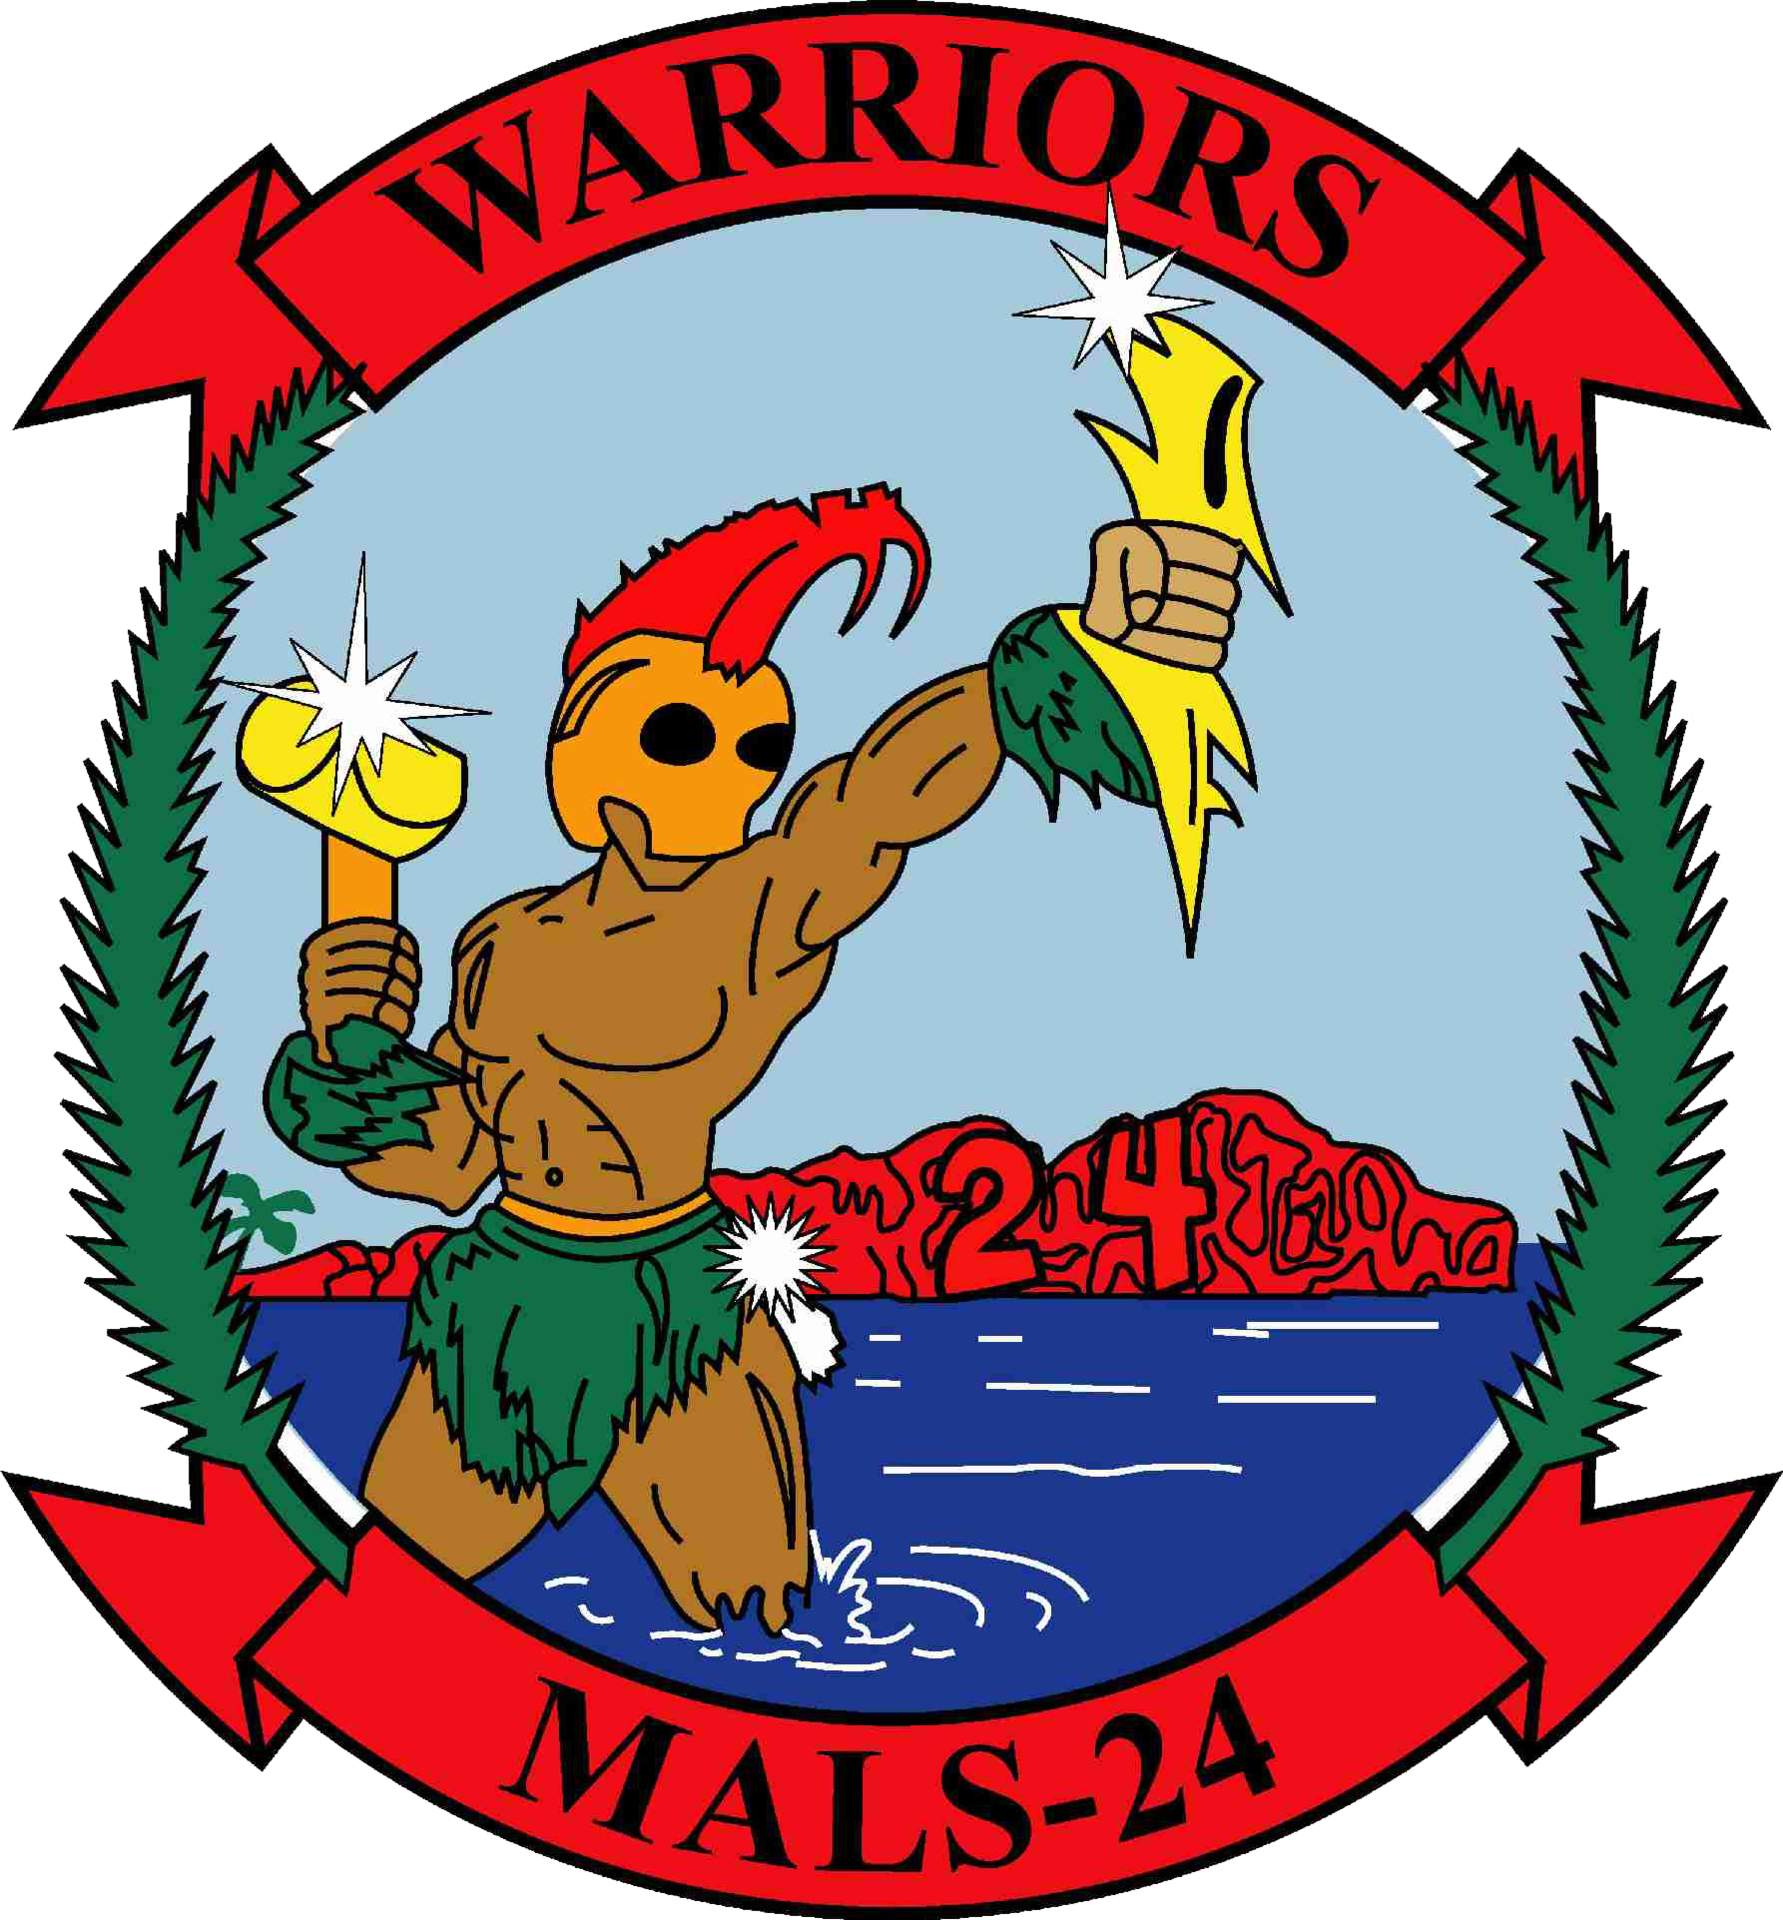 Marine Aviation Logistics Squadron 24 Mals 24 Is An